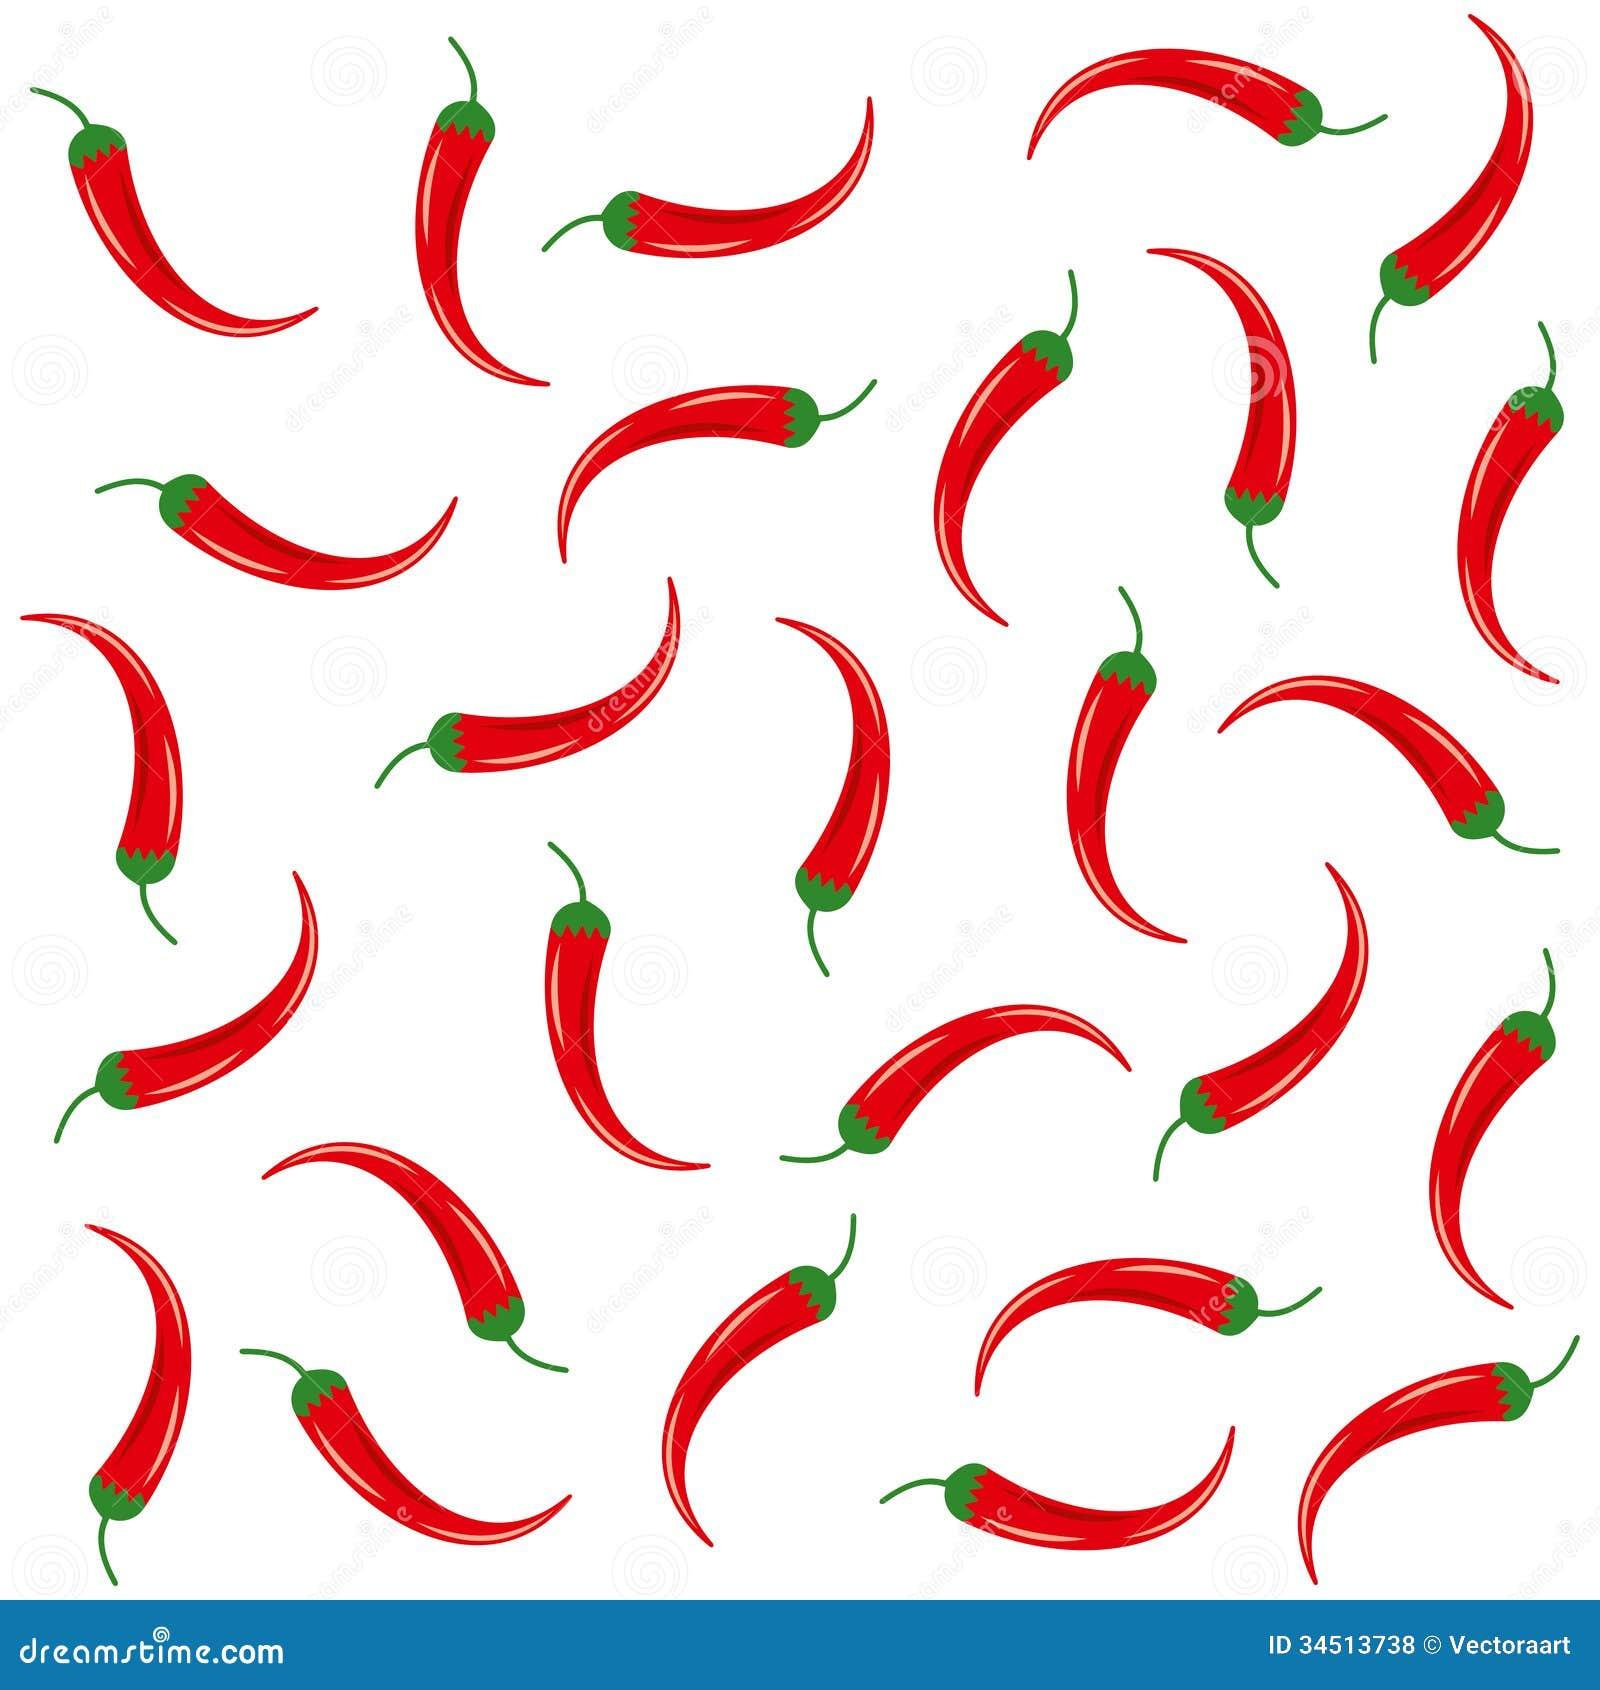 Red cili background stock vector illustration of culture 34513738 download comp altavistaventures Images